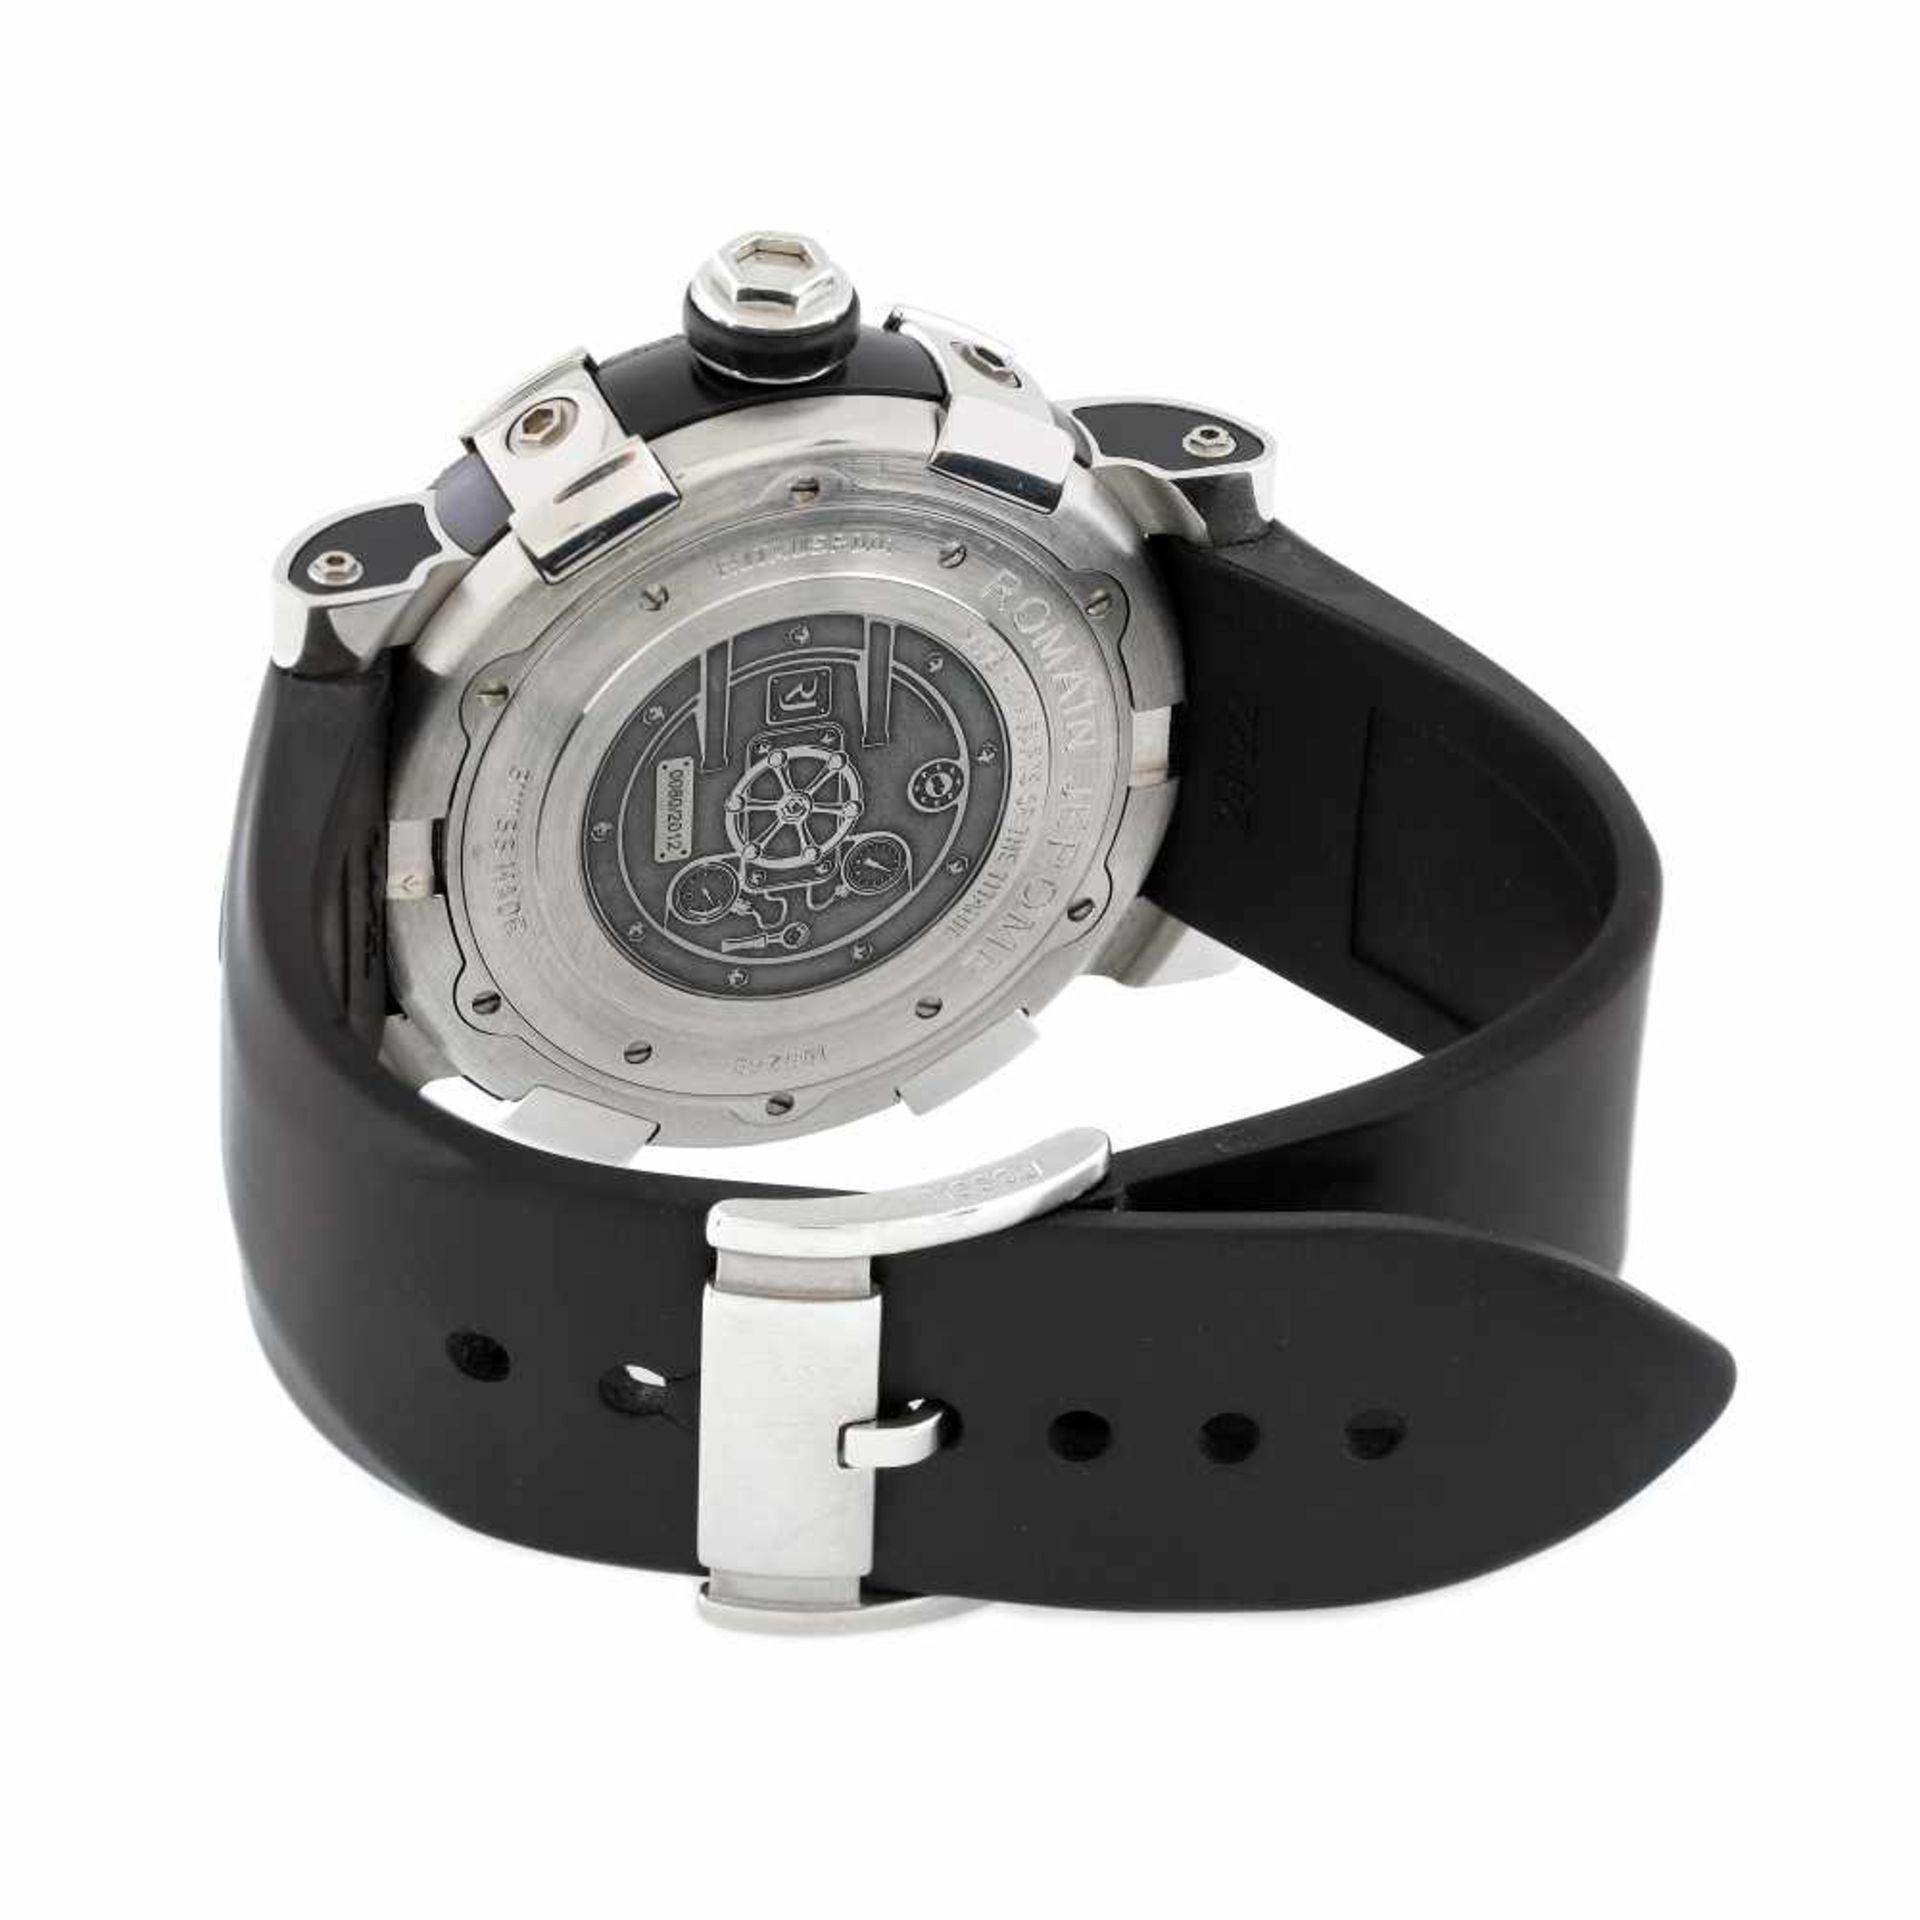 Romain Jerome Titanic-DNA wristwatch, men - Bild 2 aus 3